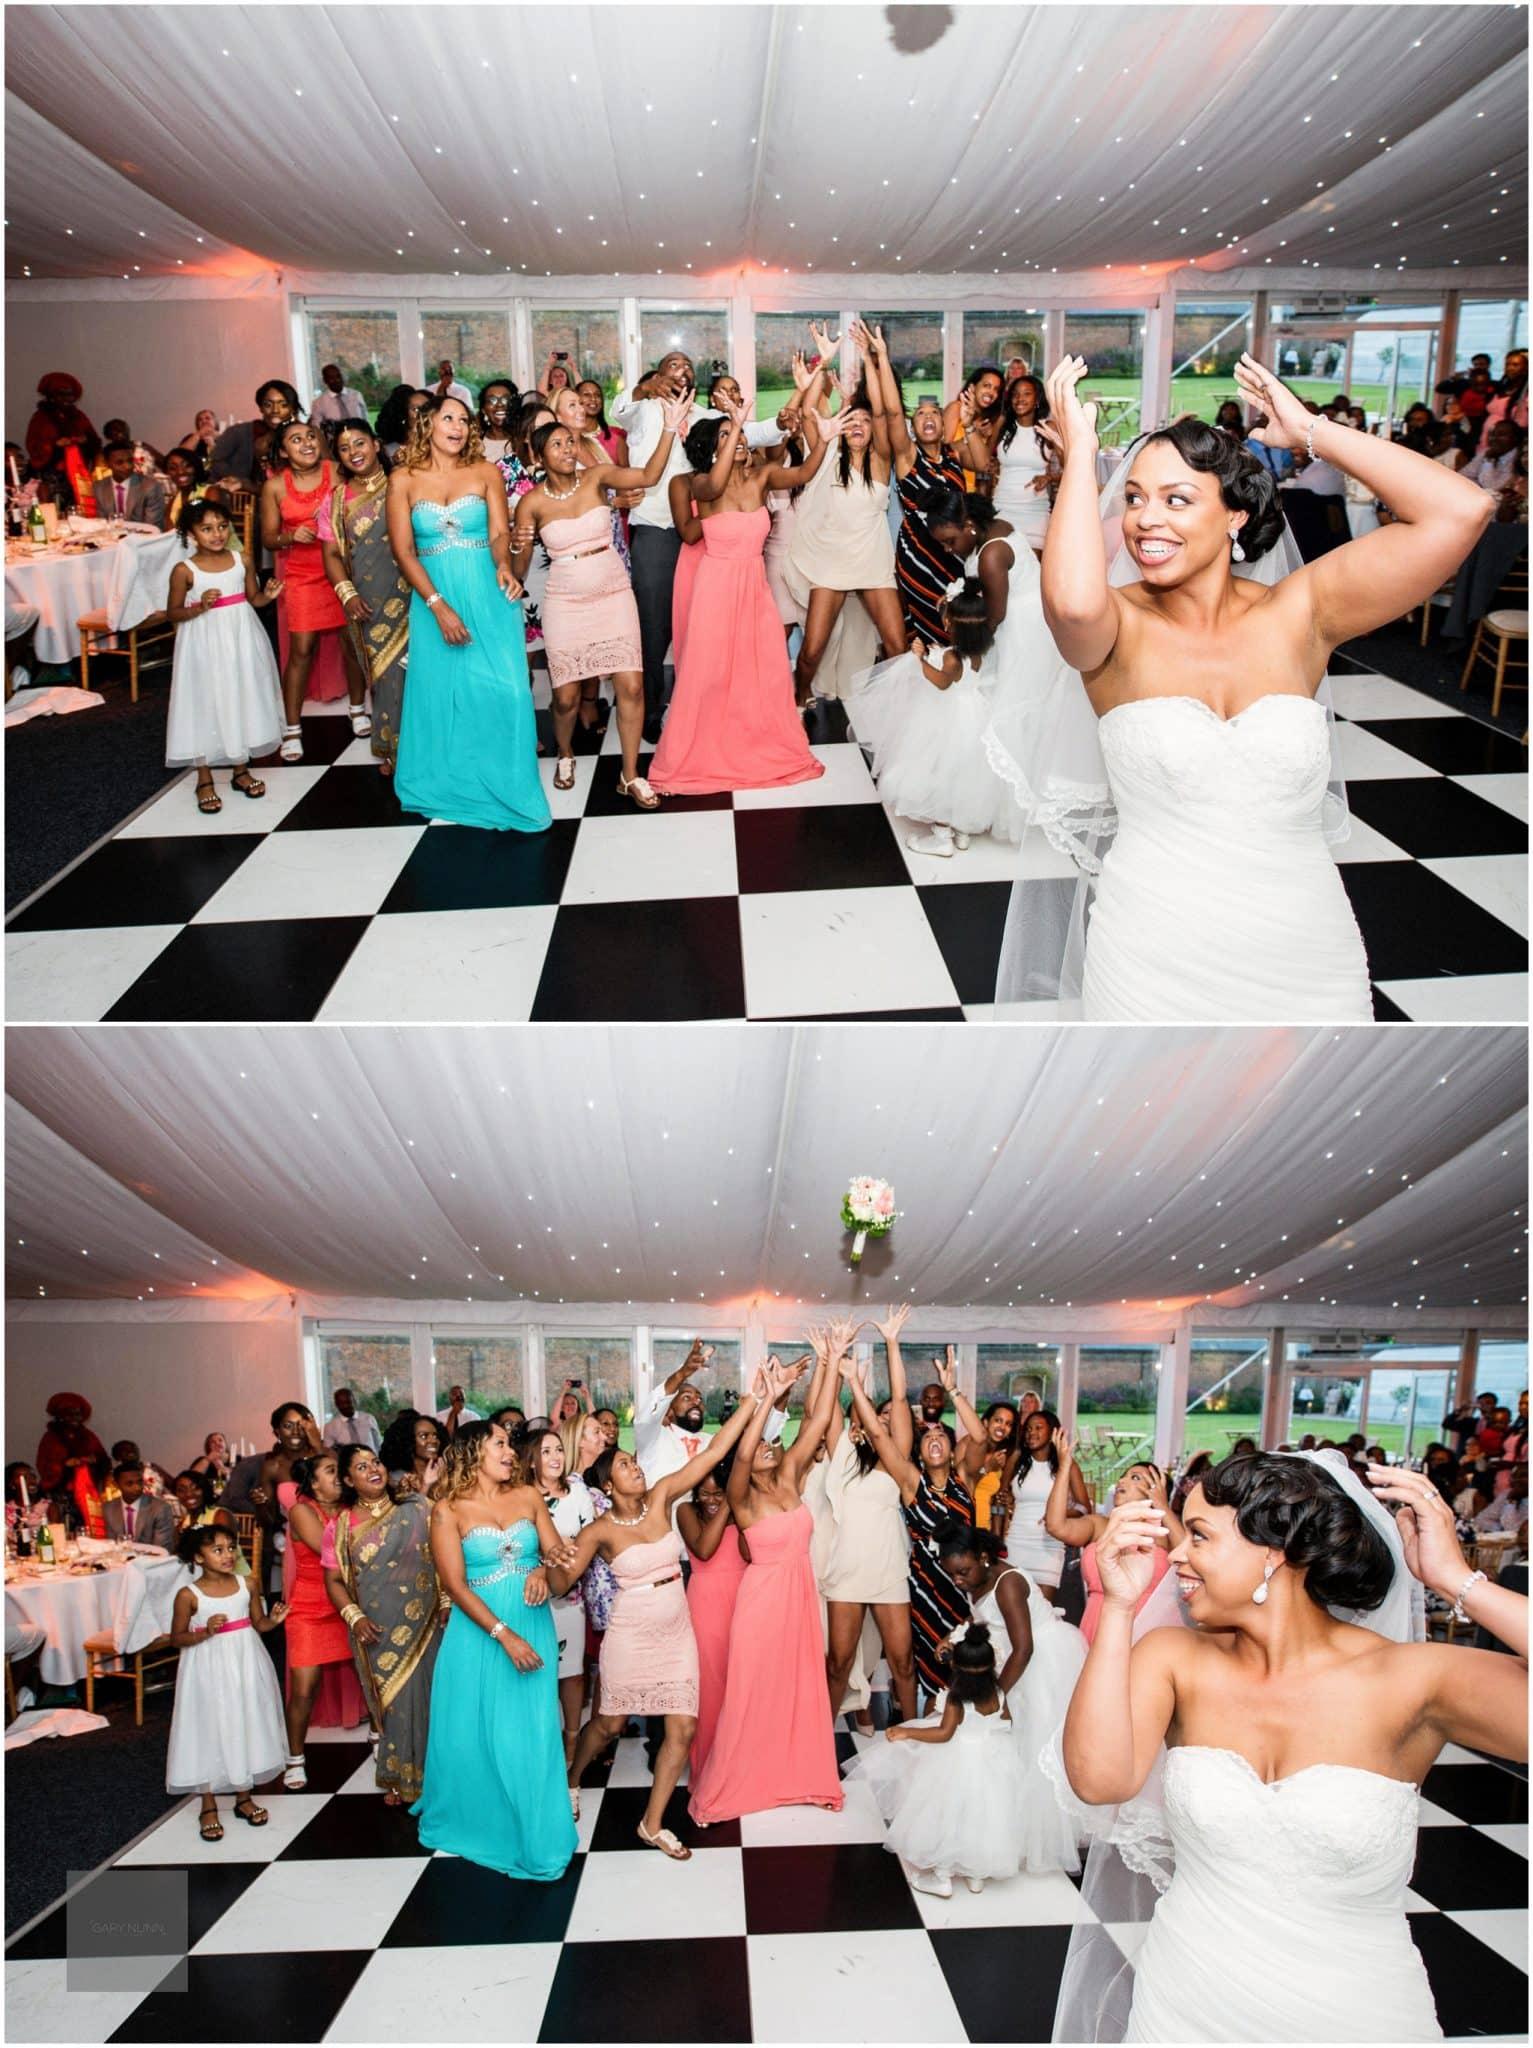 Wedding Photographer Milton Keynes, Milton Keynes Wedding Photographer